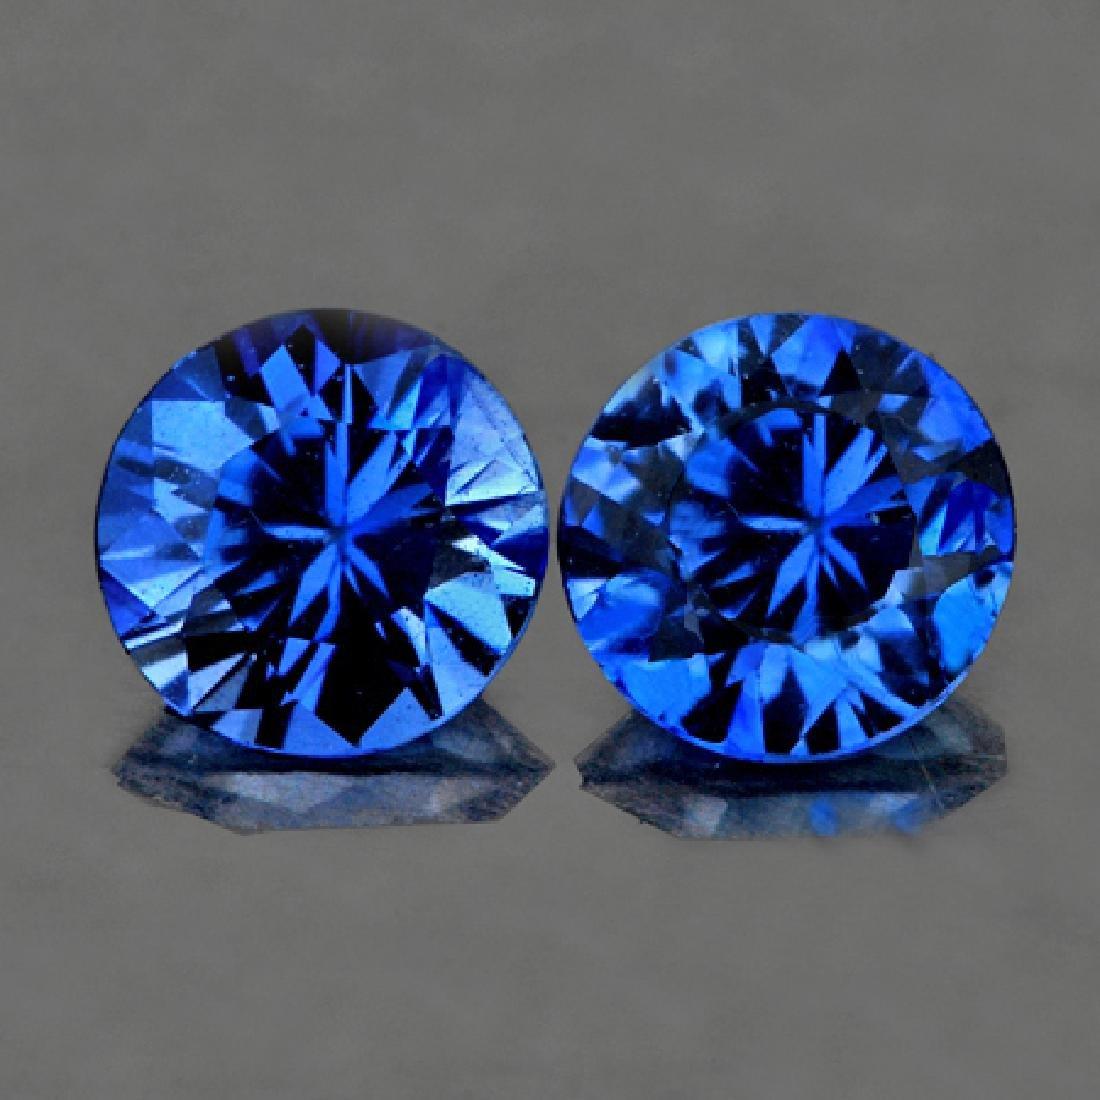 Natural Royal Blue Kashmir Sapphire Pair 3.50 MM